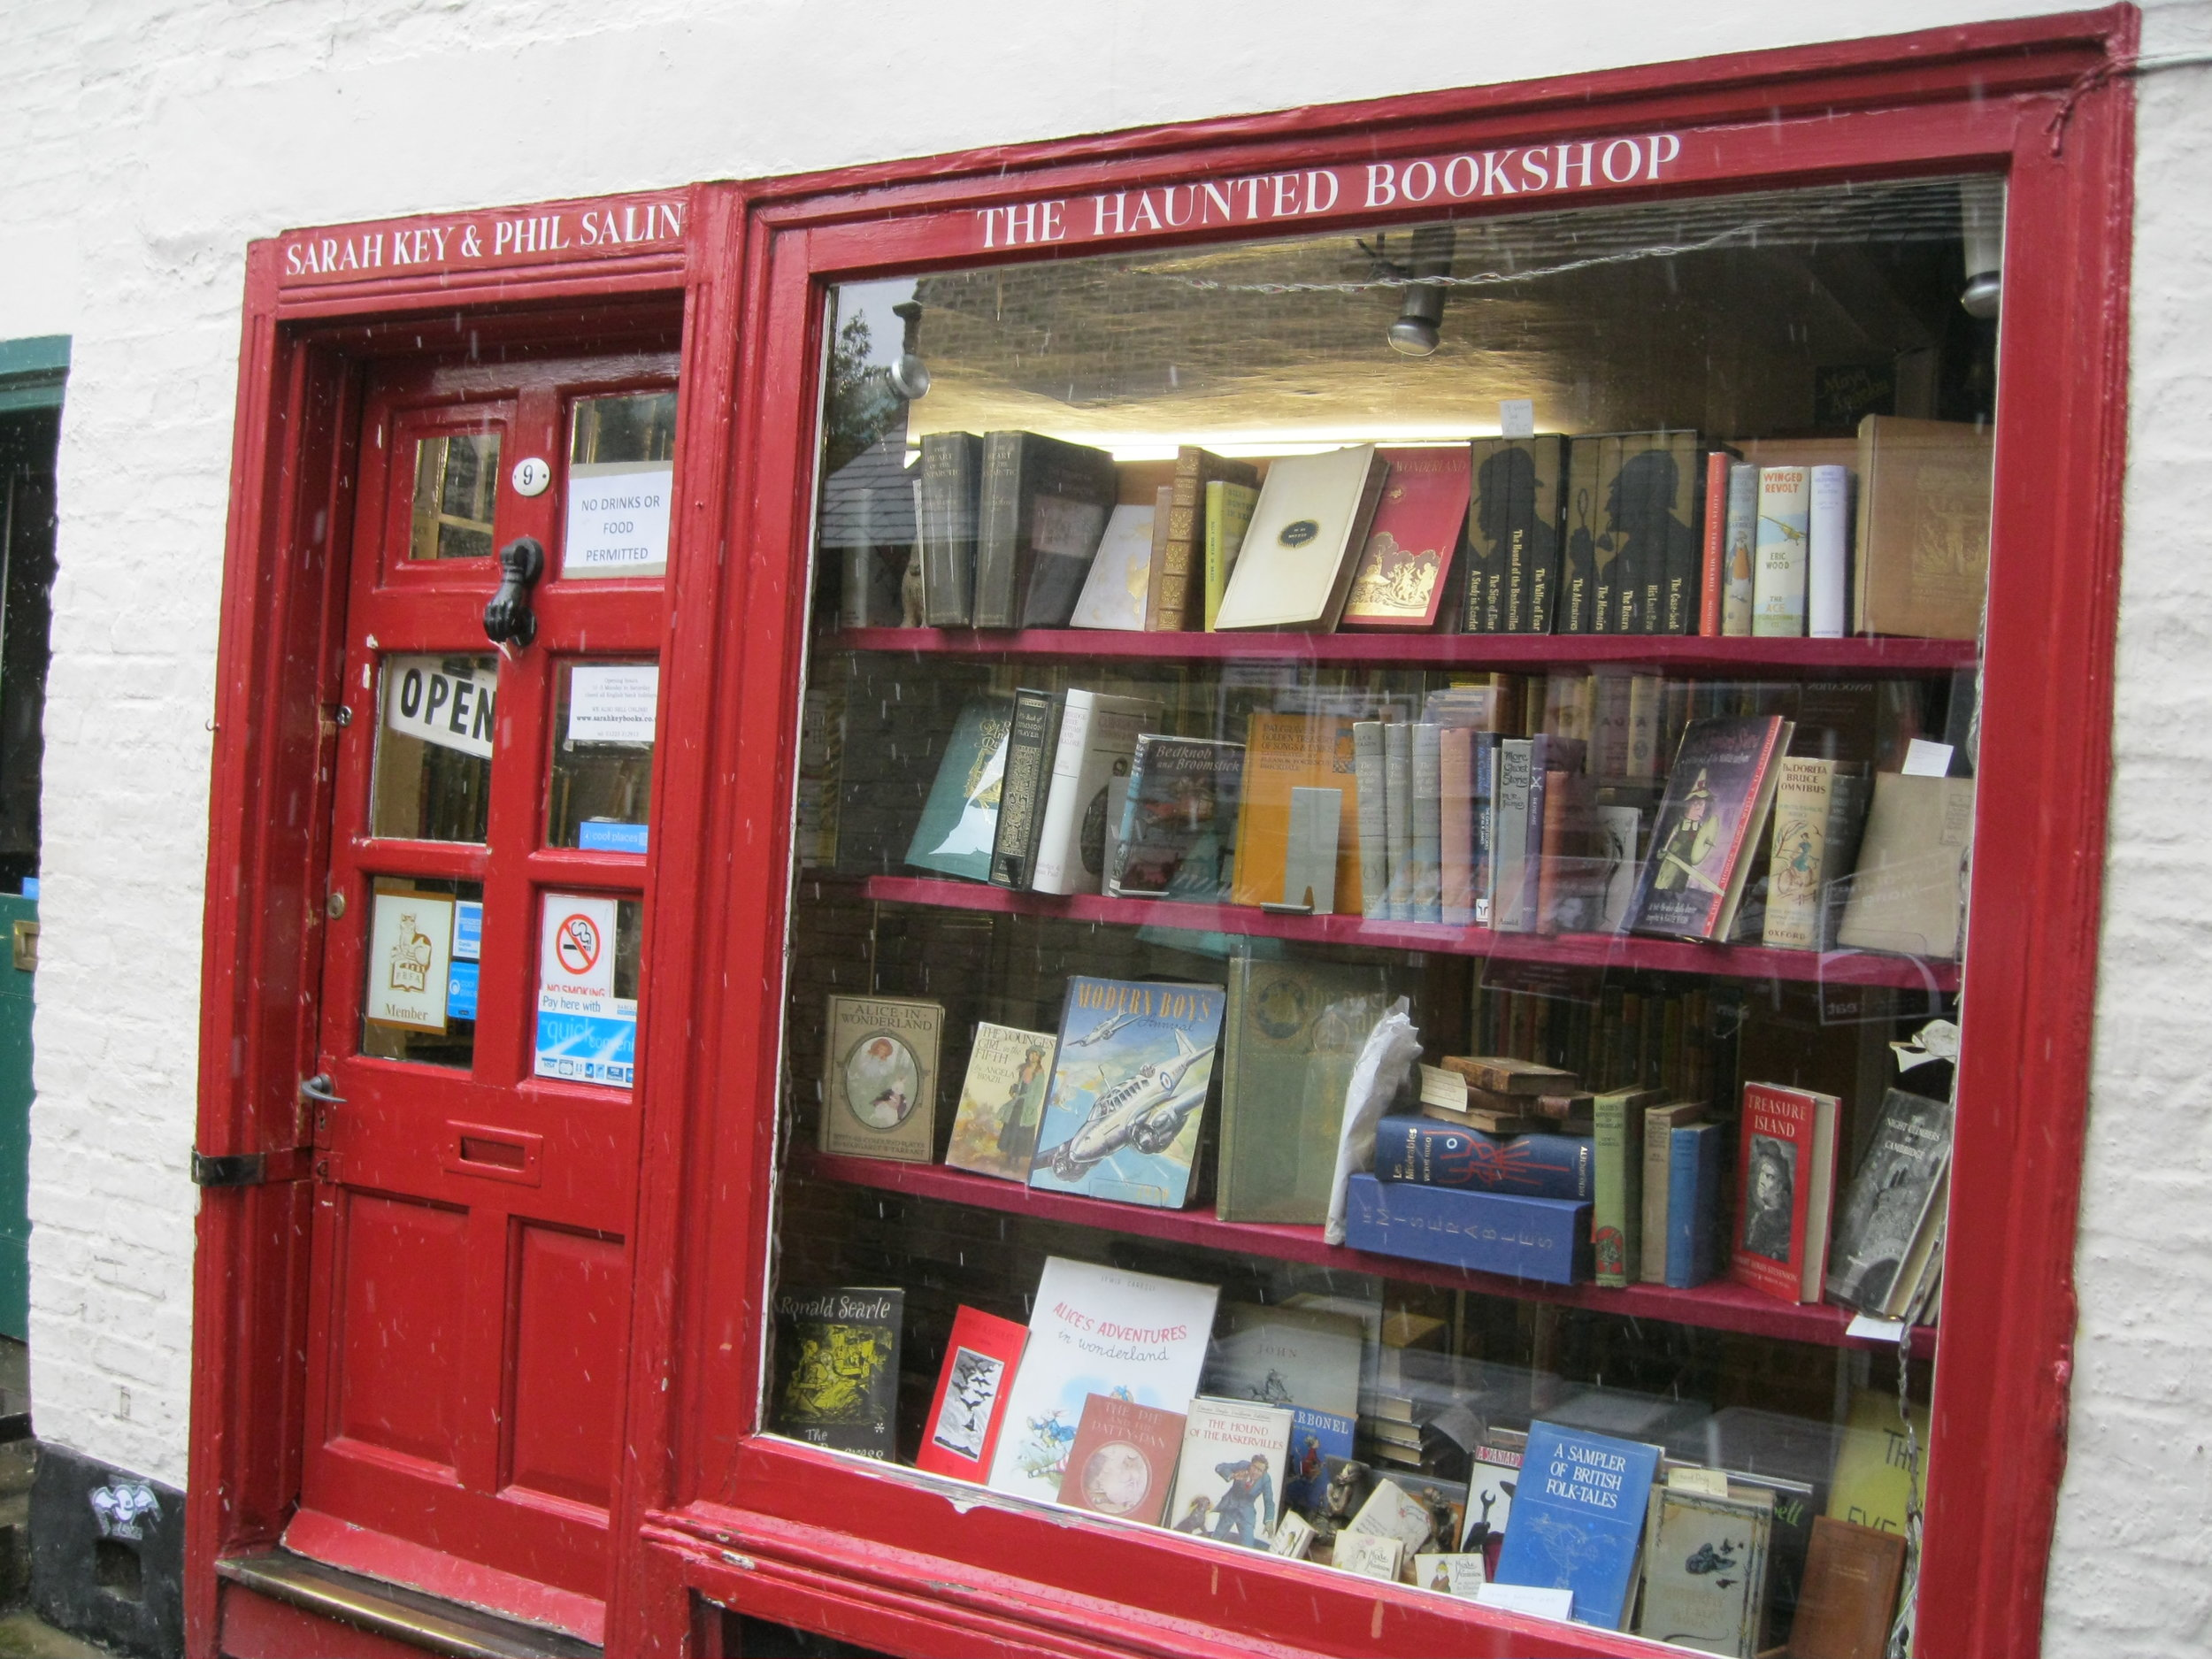 Haunted bookshop img_1826.jpg